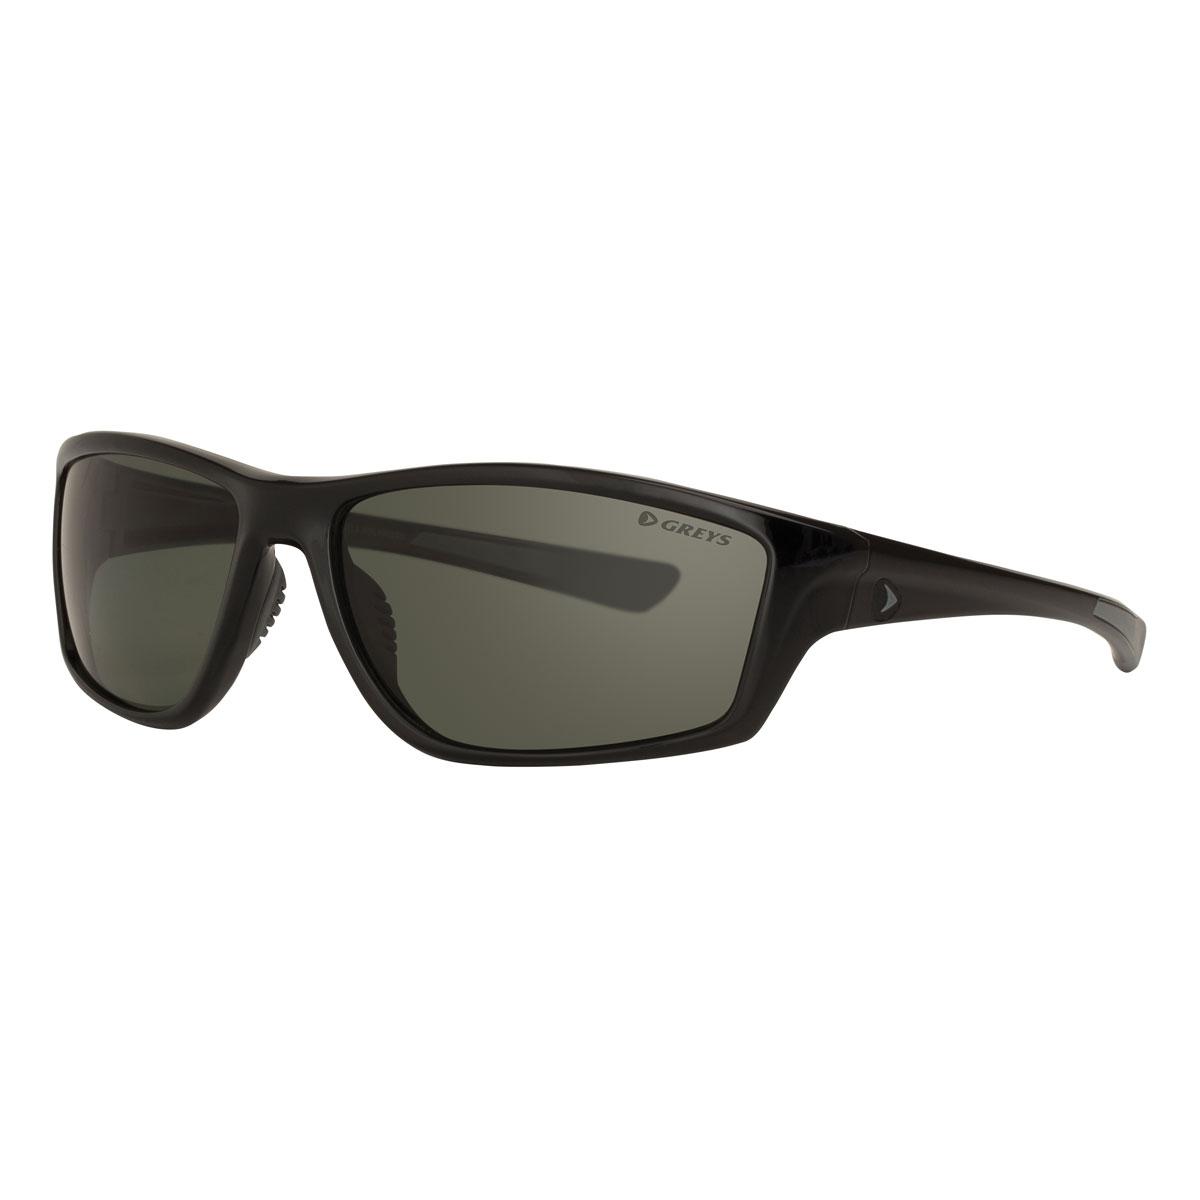 ae9faf1cd3 Image of Greys G3 Sunglasses - Gloss Black Frame Green Grey Lens ...